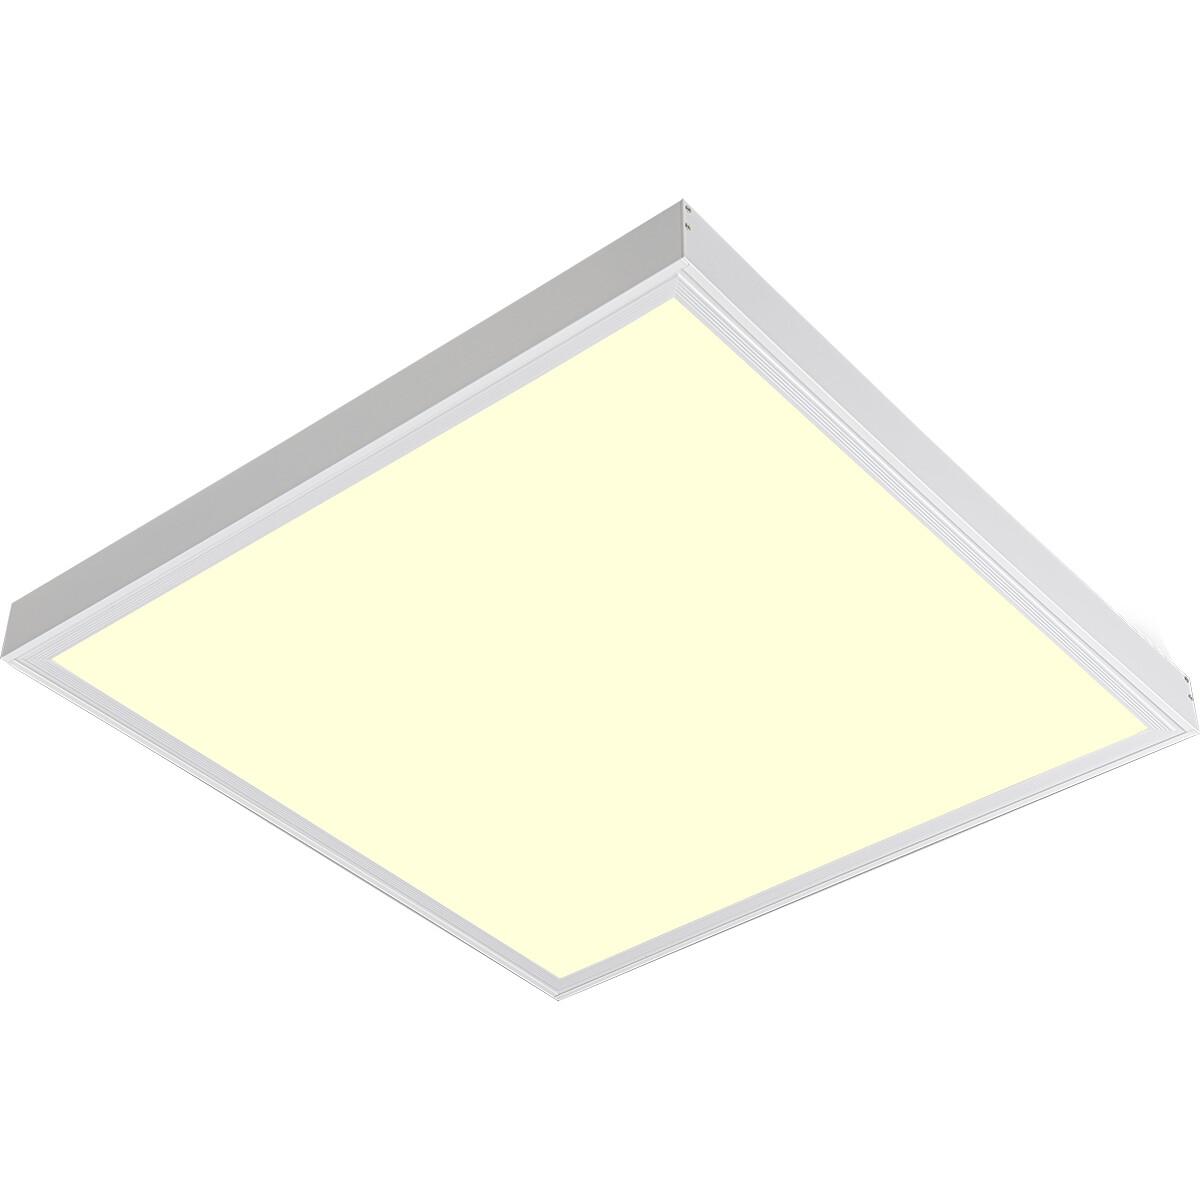 LED Paneel - Aigi Clena - 60x60 Warm Wit 3000K - 40W Opbouw Vierkant - Mat Wit - Flikkervrij